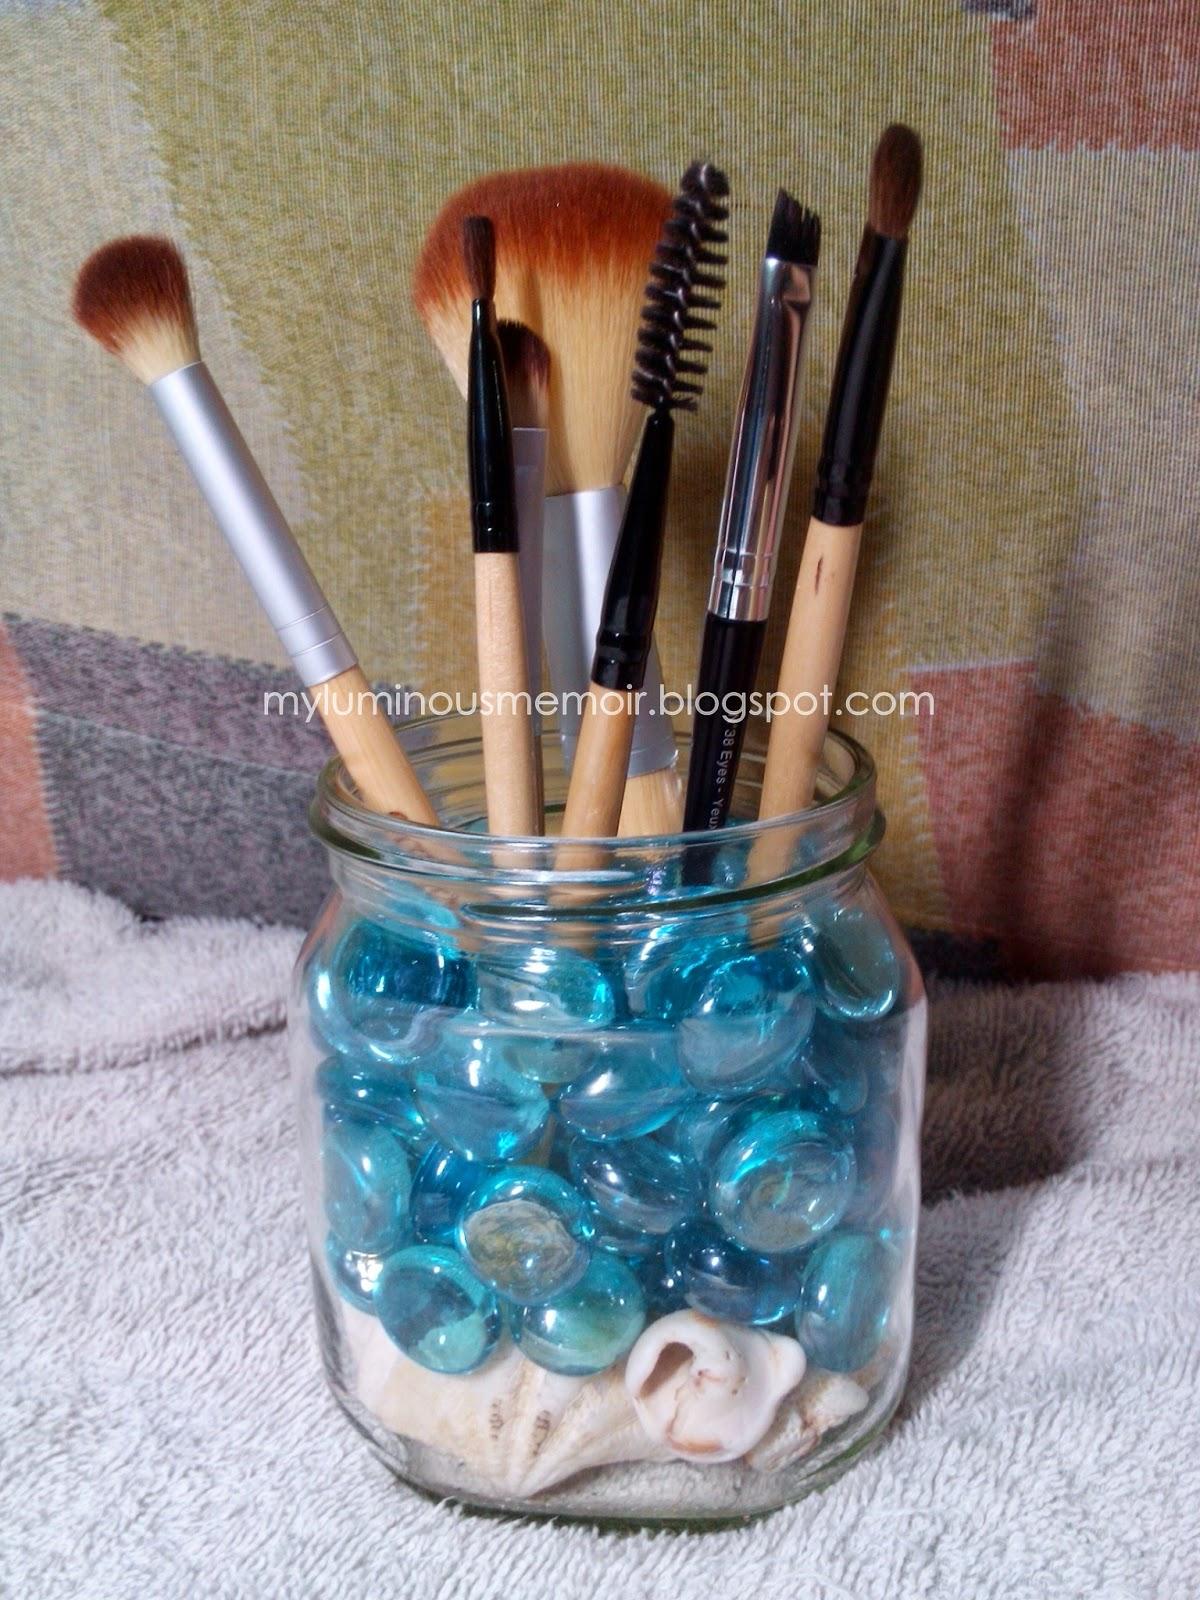 Do it yourself makeup brush organizer beautyctionary create your own diy makeup brush organizer now enjoy solutioingenieria Choice Image